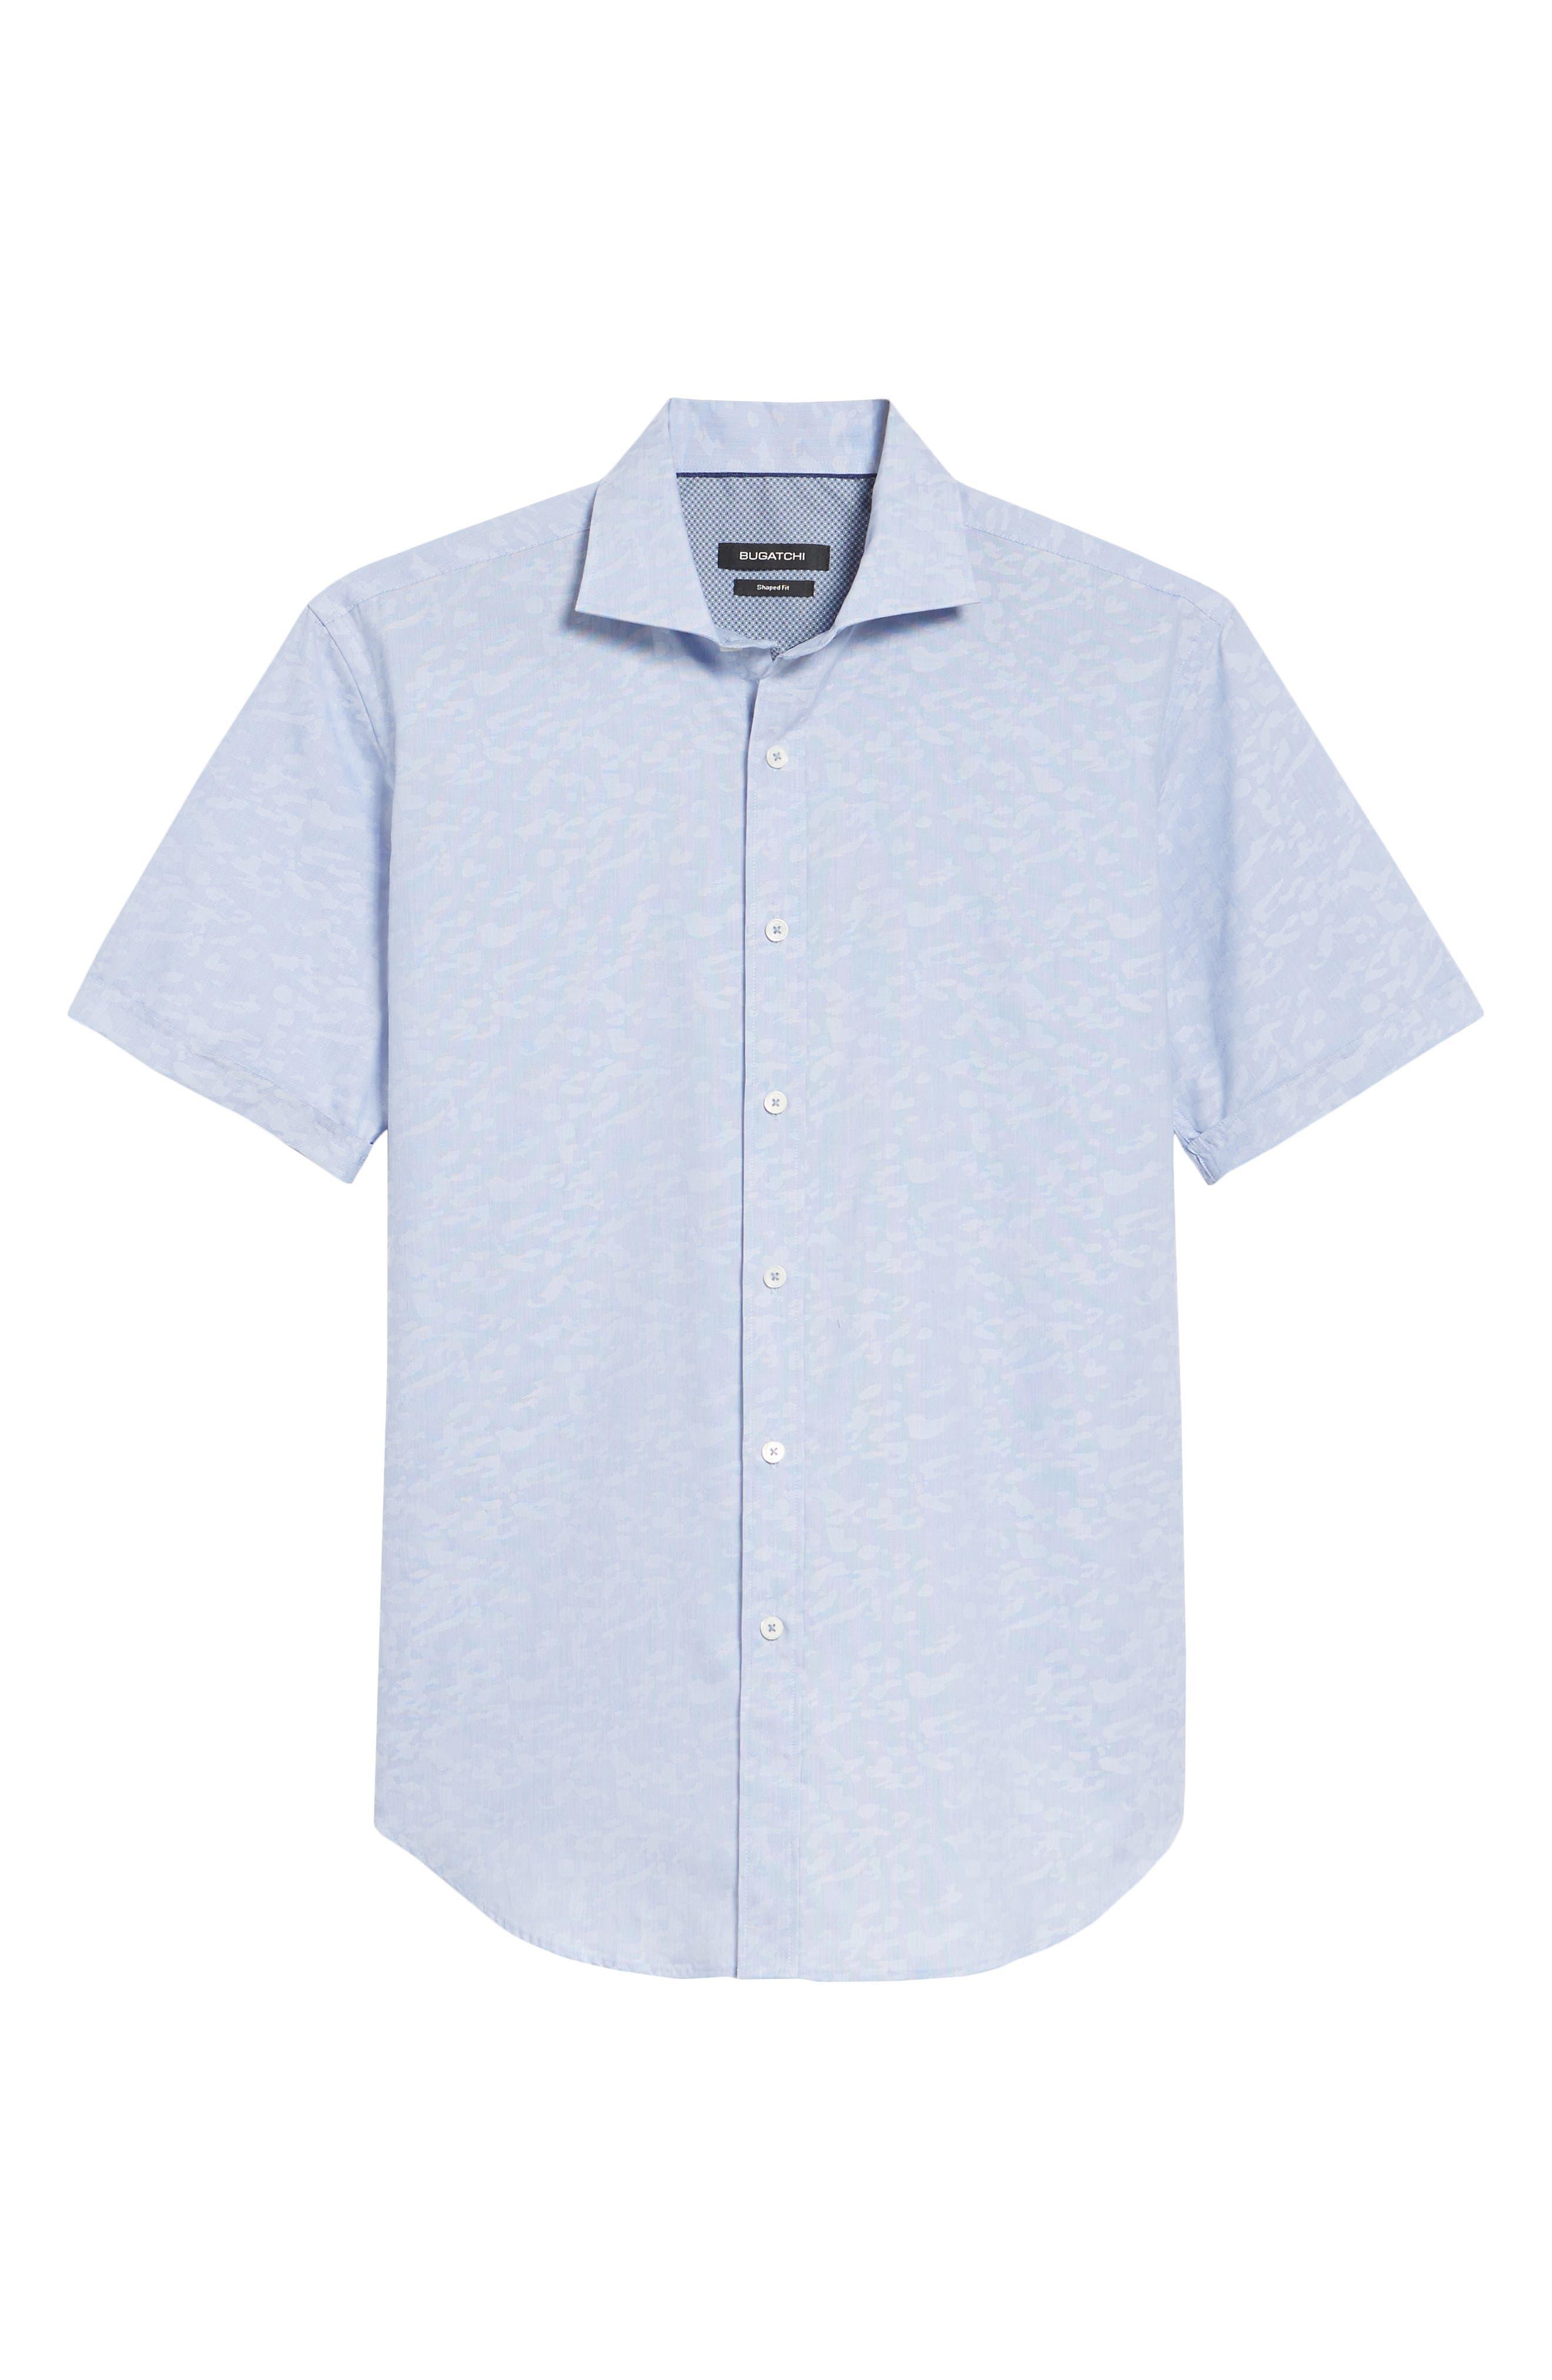 Woven Sport Shirt,                             Alternate thumbnail 6, color,                             CLASSIC BLUE